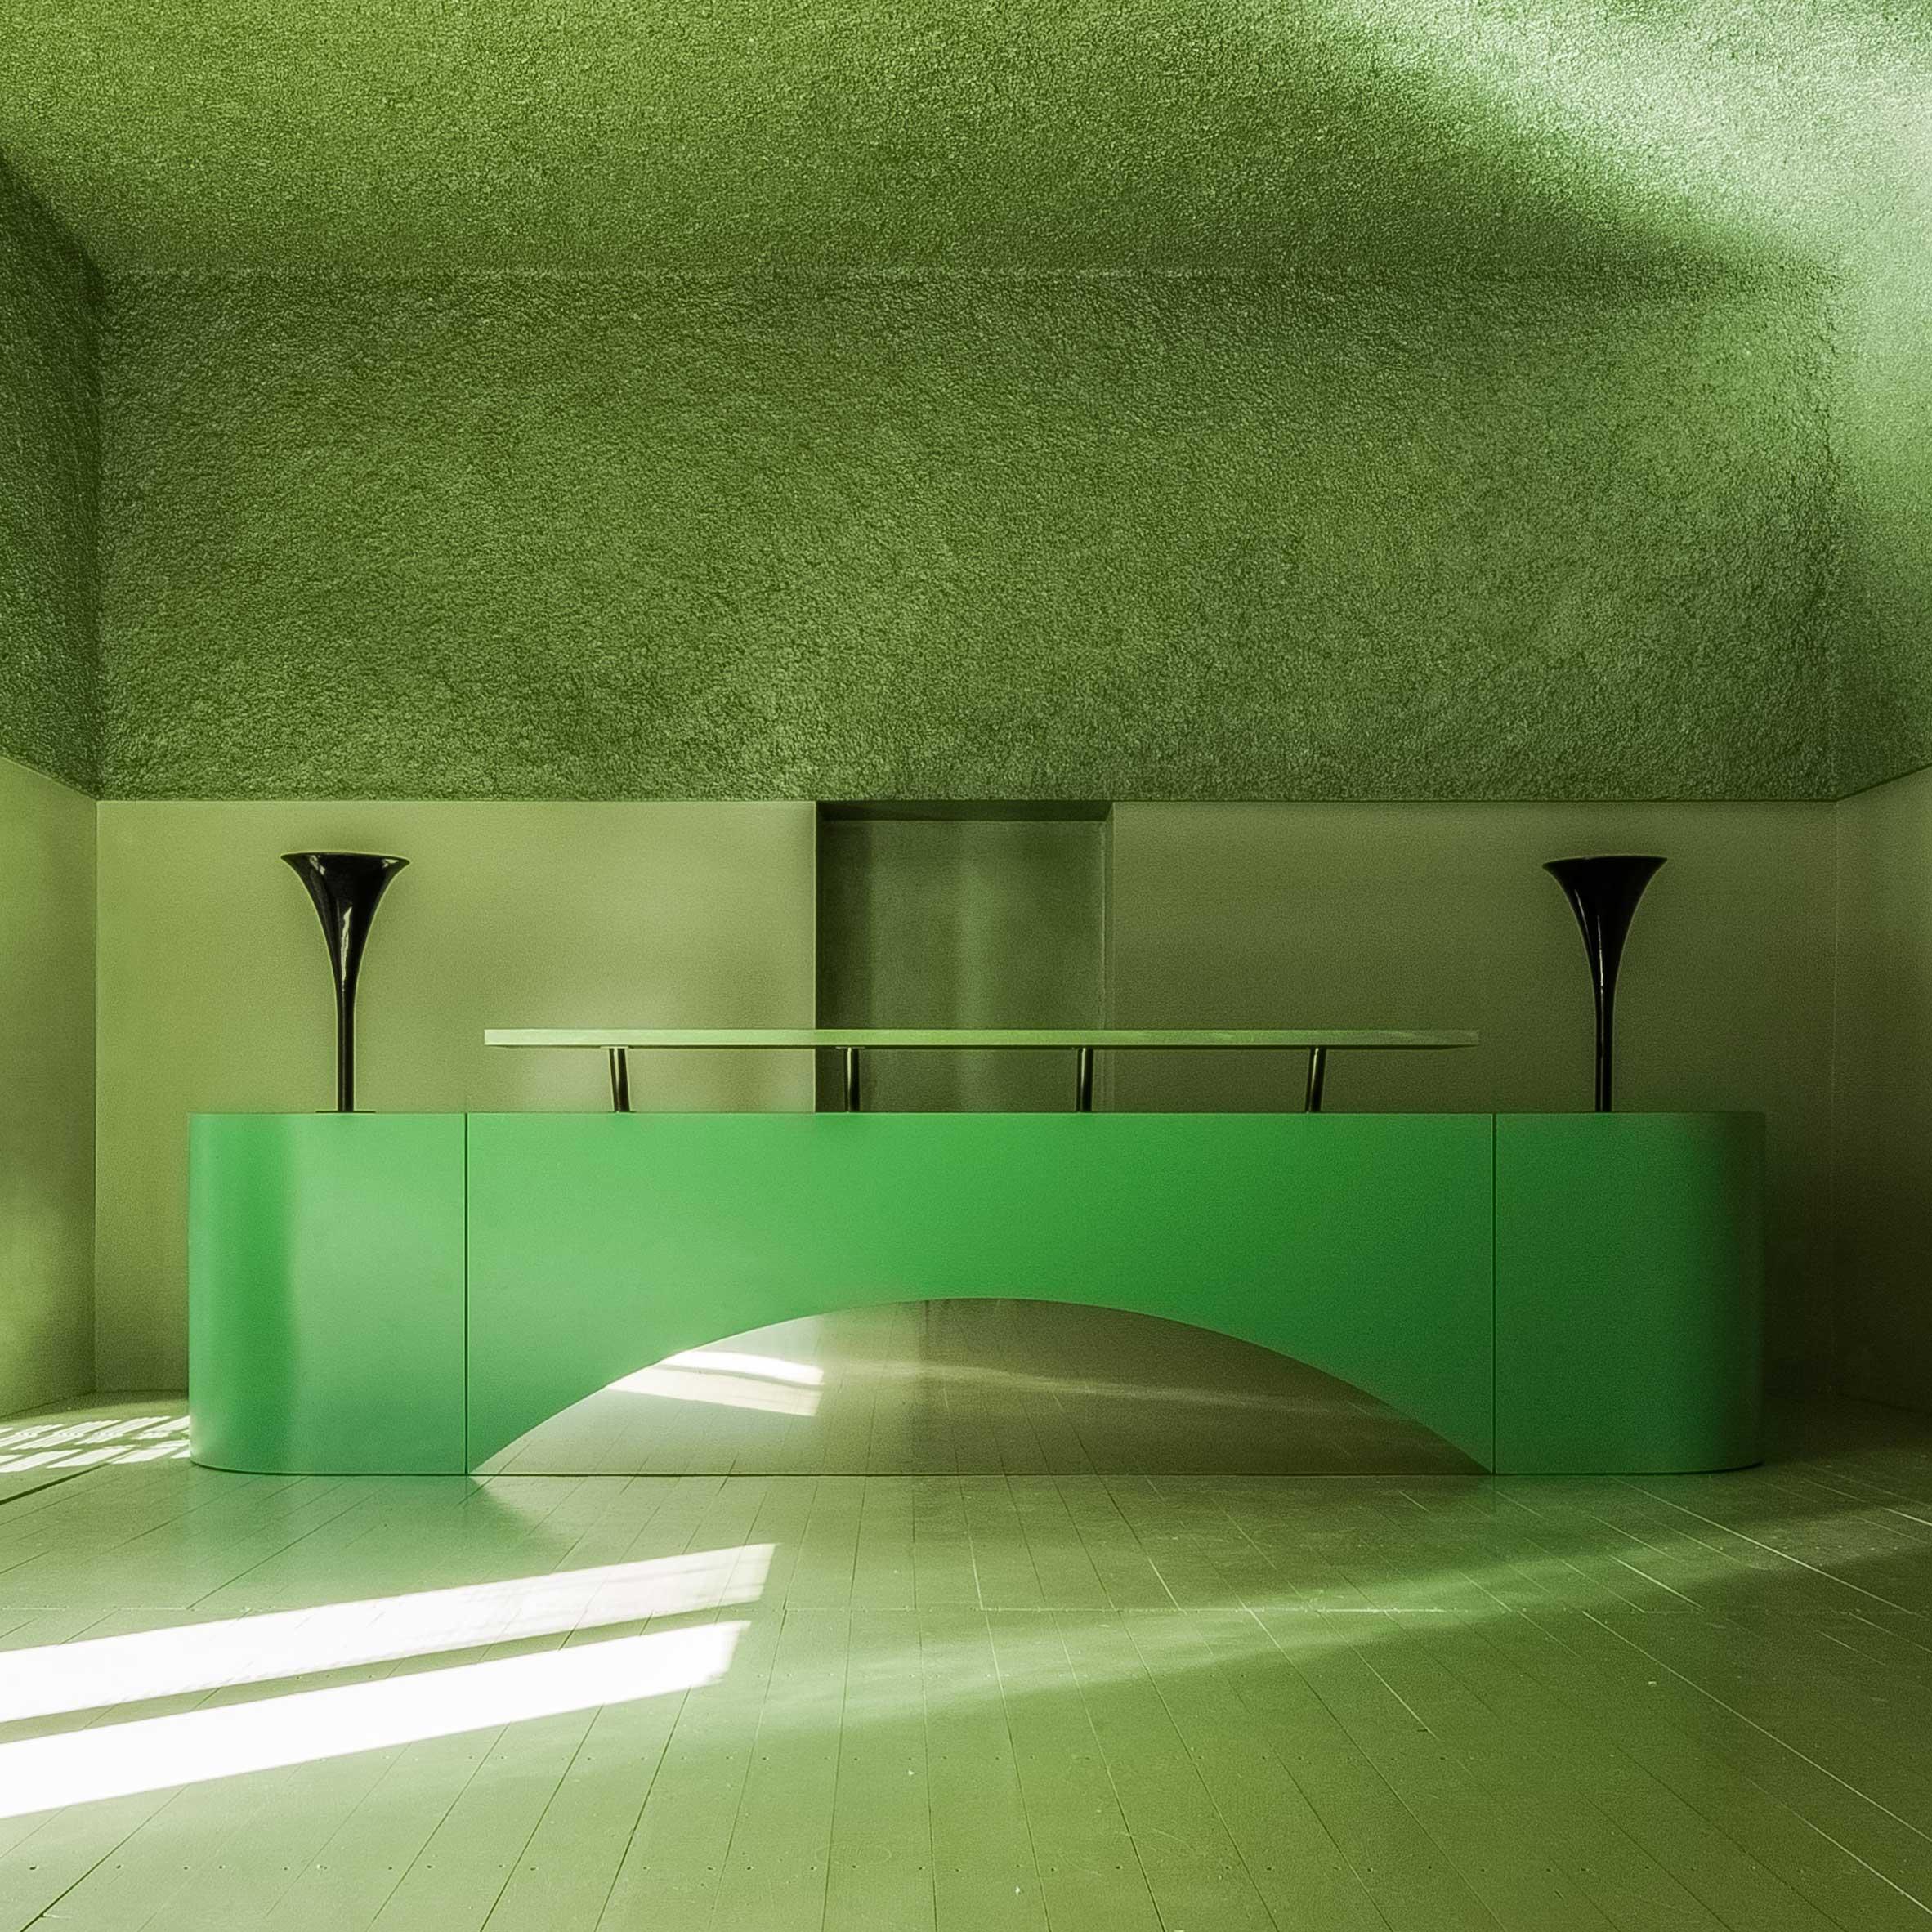 Green architecture and design | Dezeen